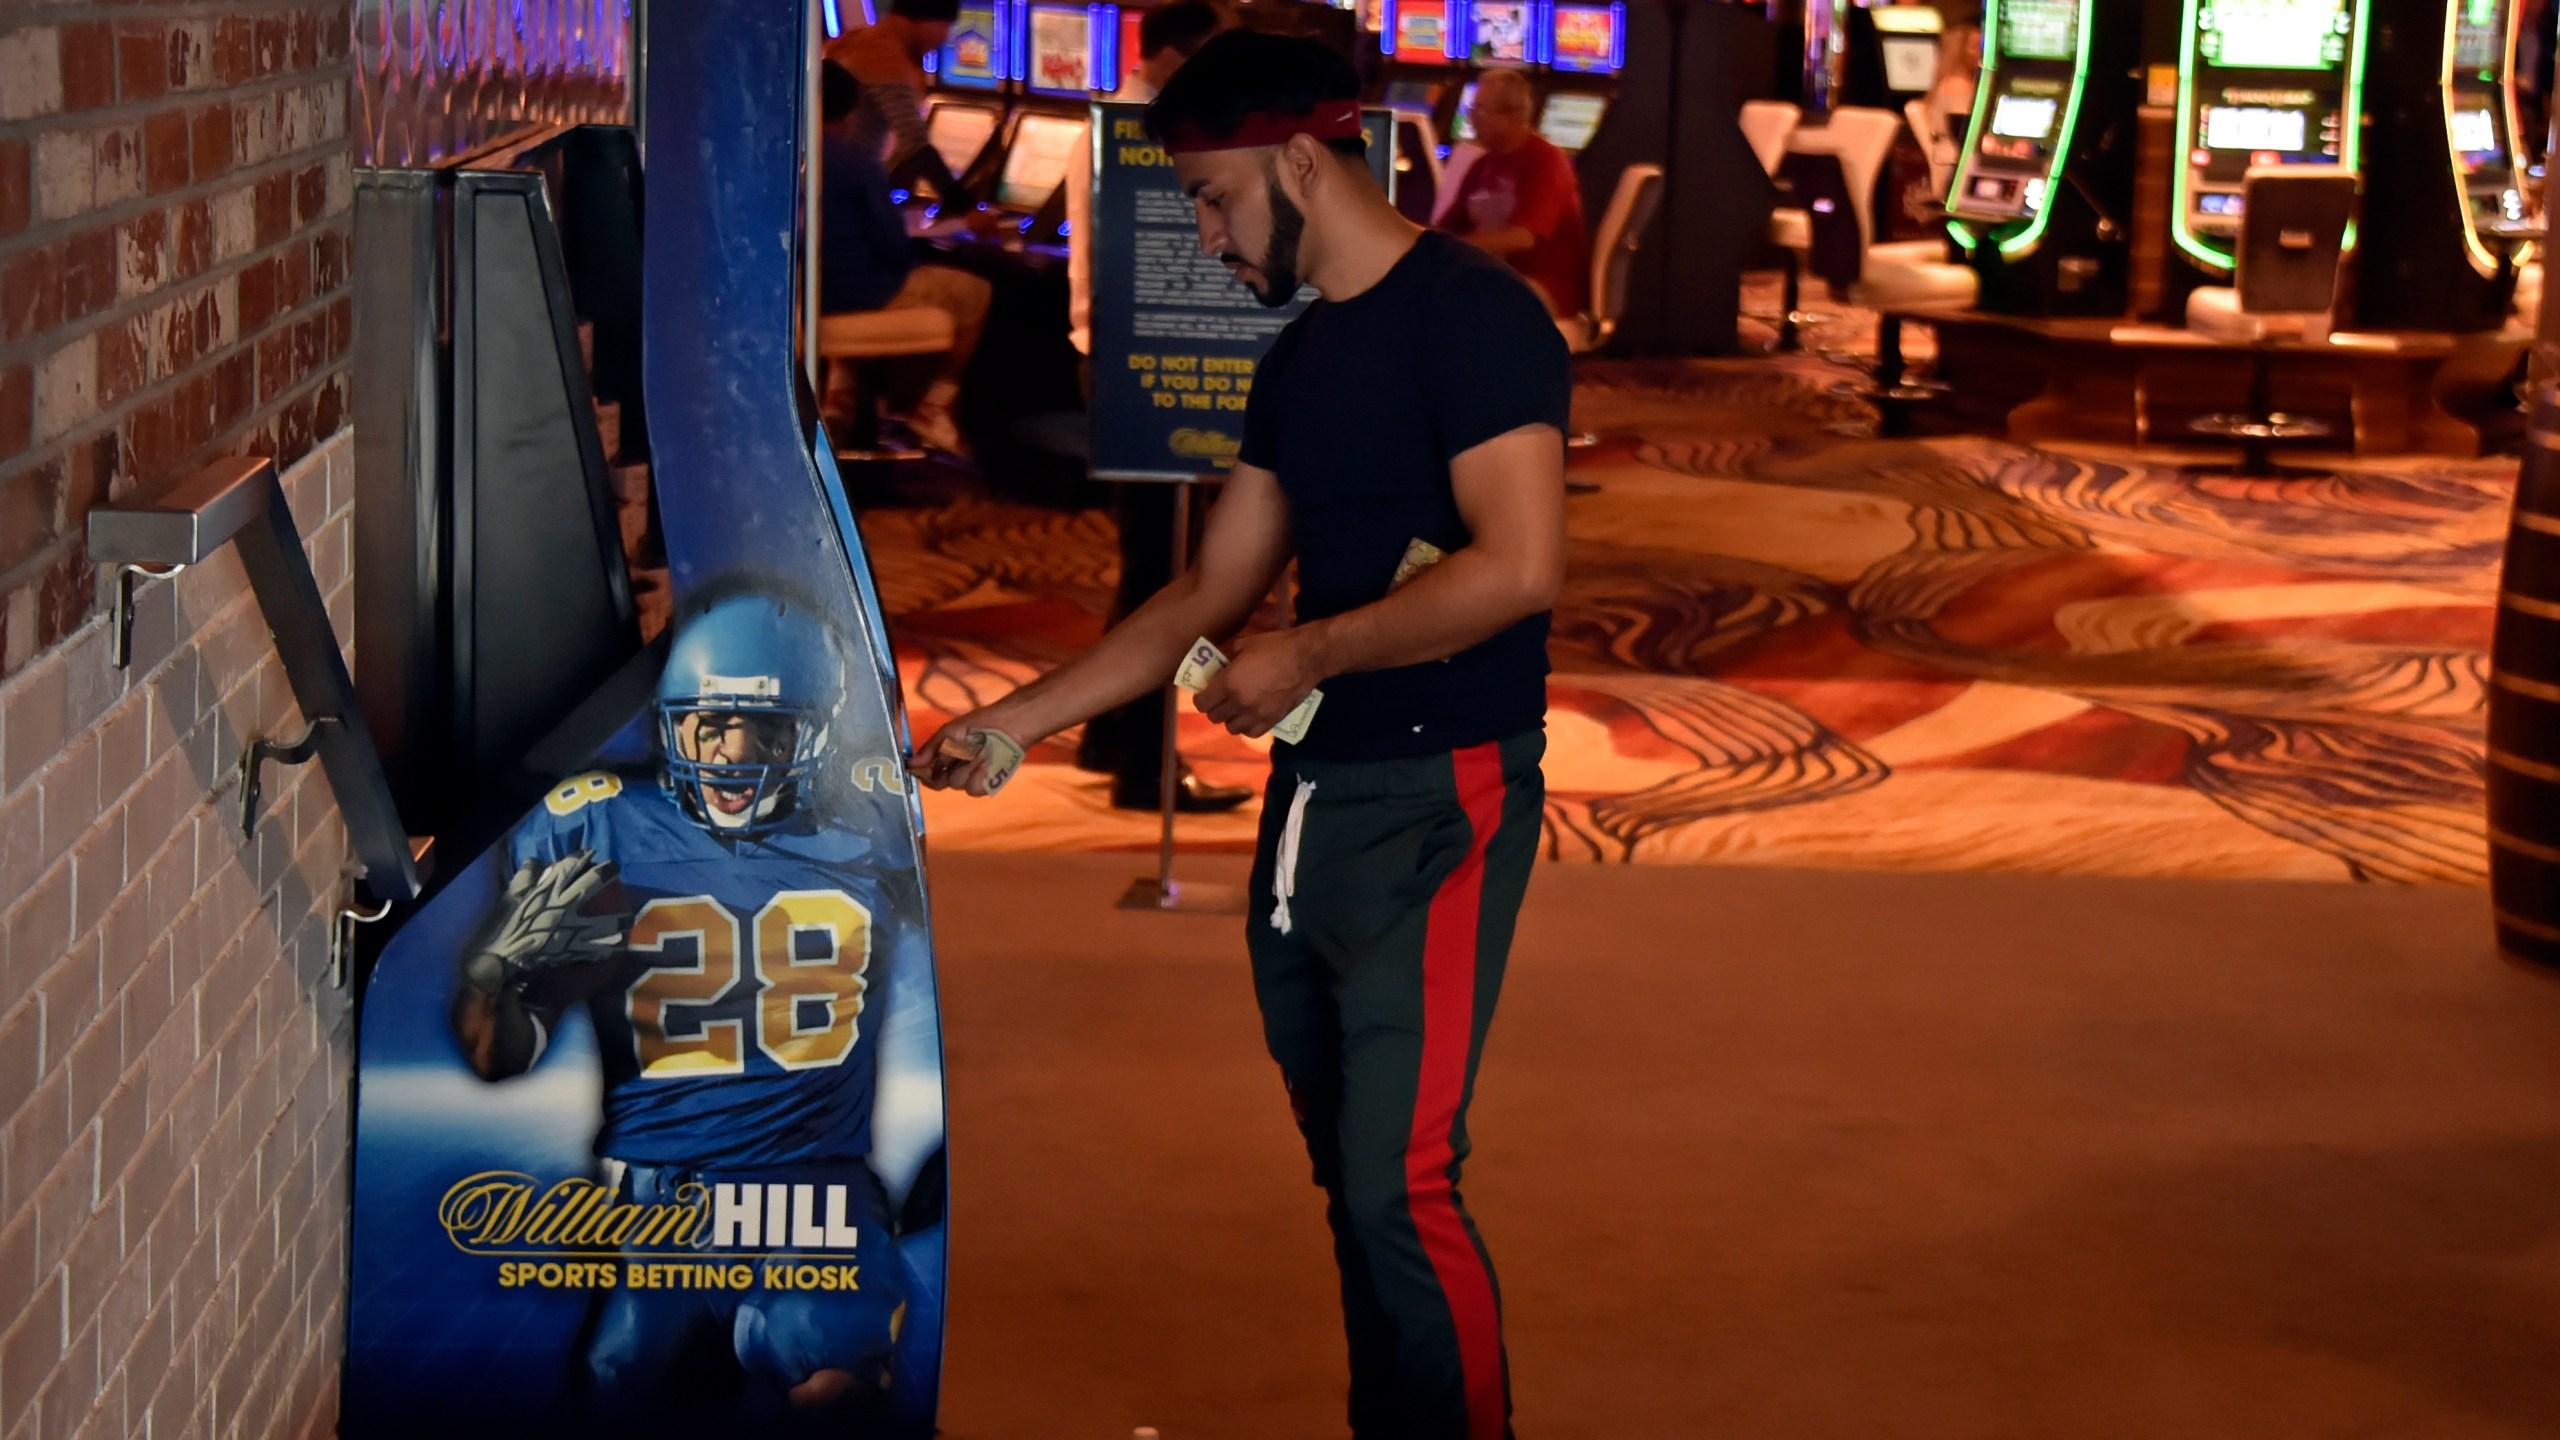 Sls casino sportsbook betting college football betting guide